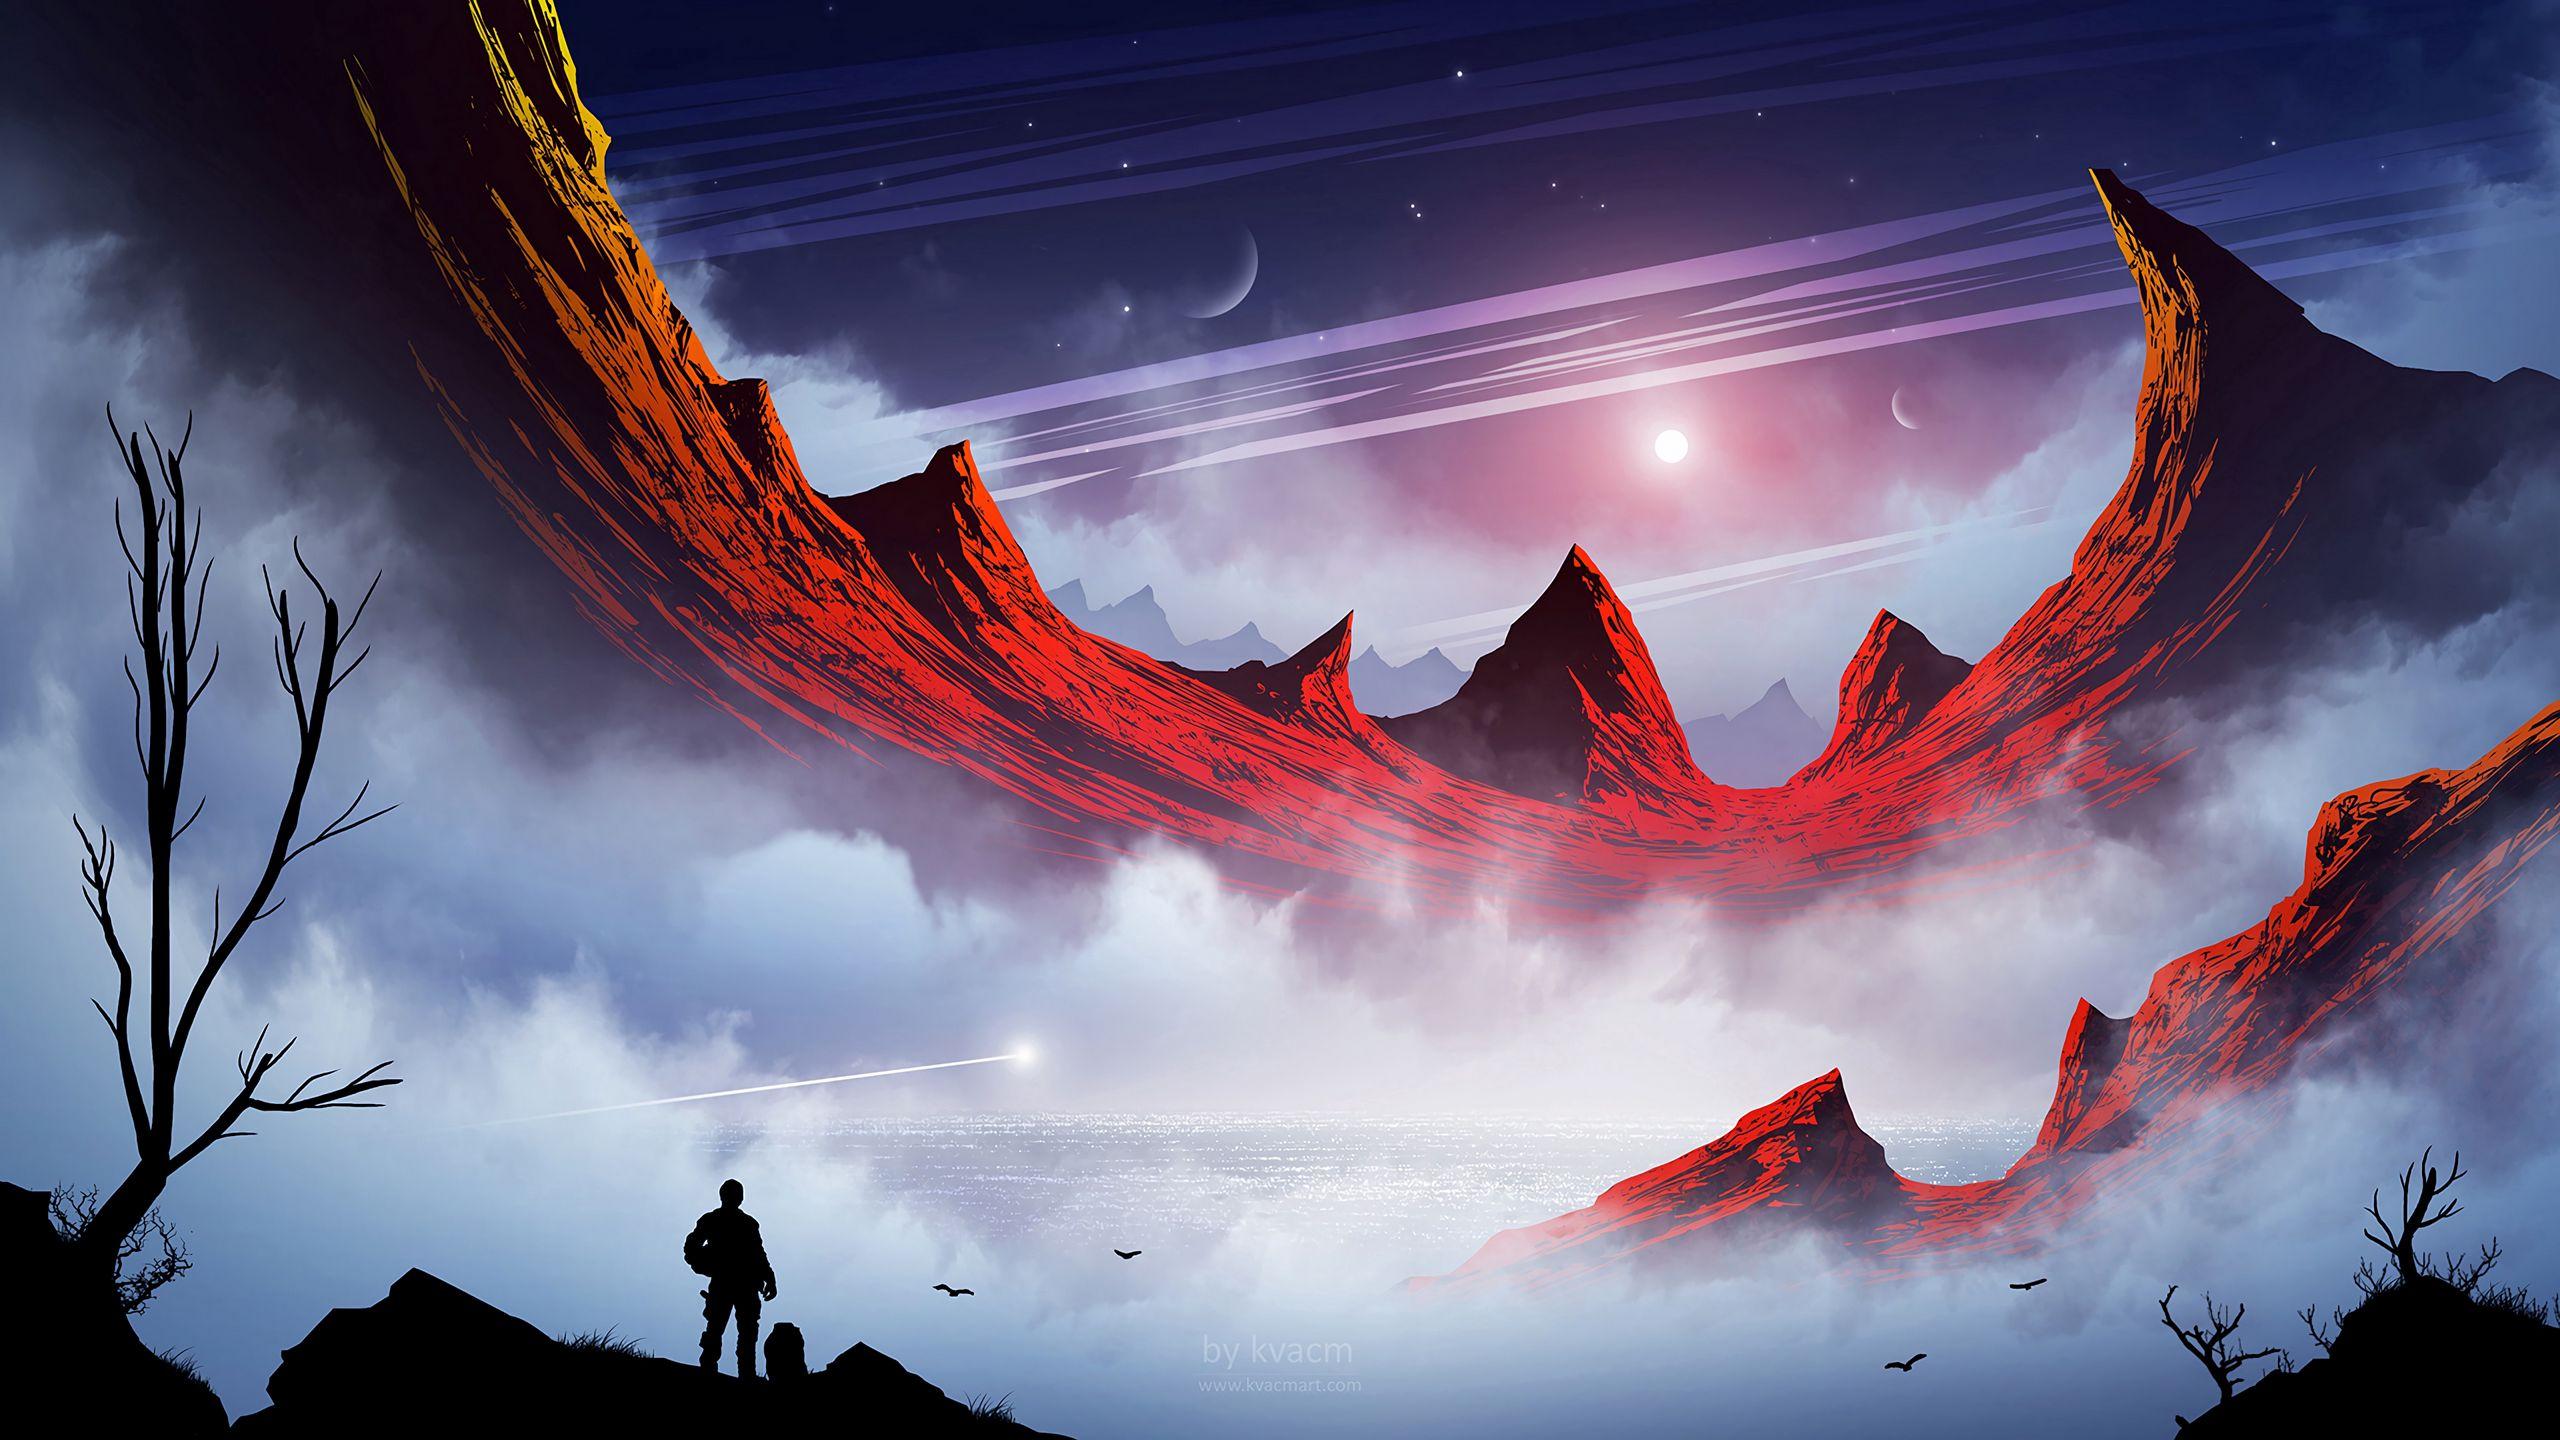 Wallpaper Silhouette Mountains Fog Lake Travel Sci Fi Pixel Art Landscape 2560x1440 Download Hd Wallpaper Wallpapertip